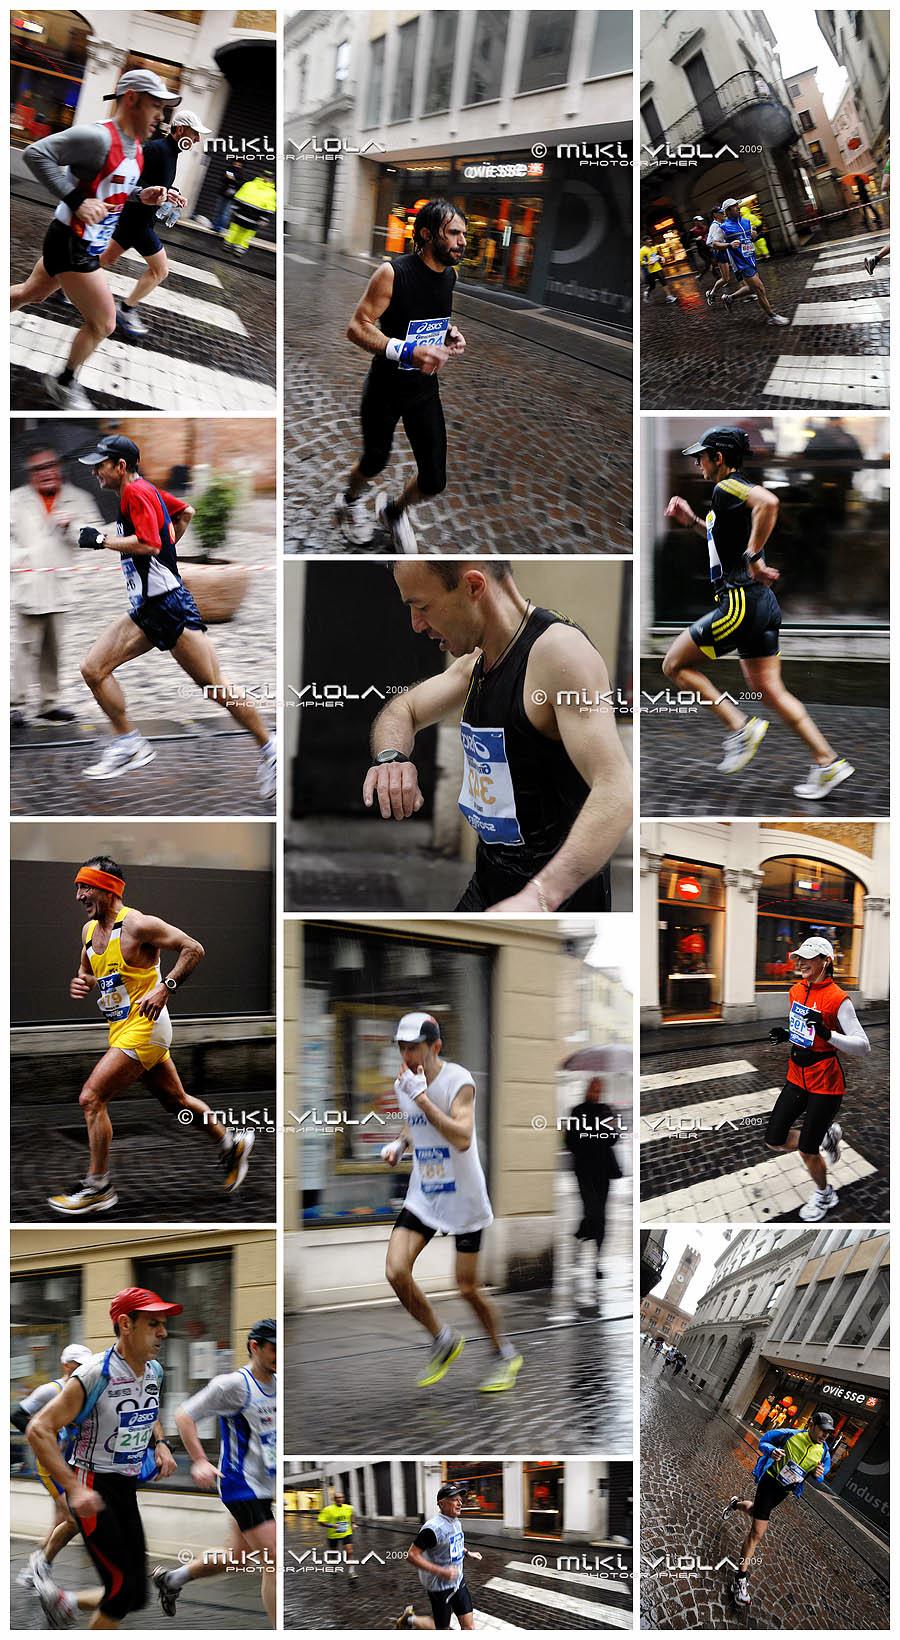 time-to-lose_miki-viola_treviso-marathon-2009-0031